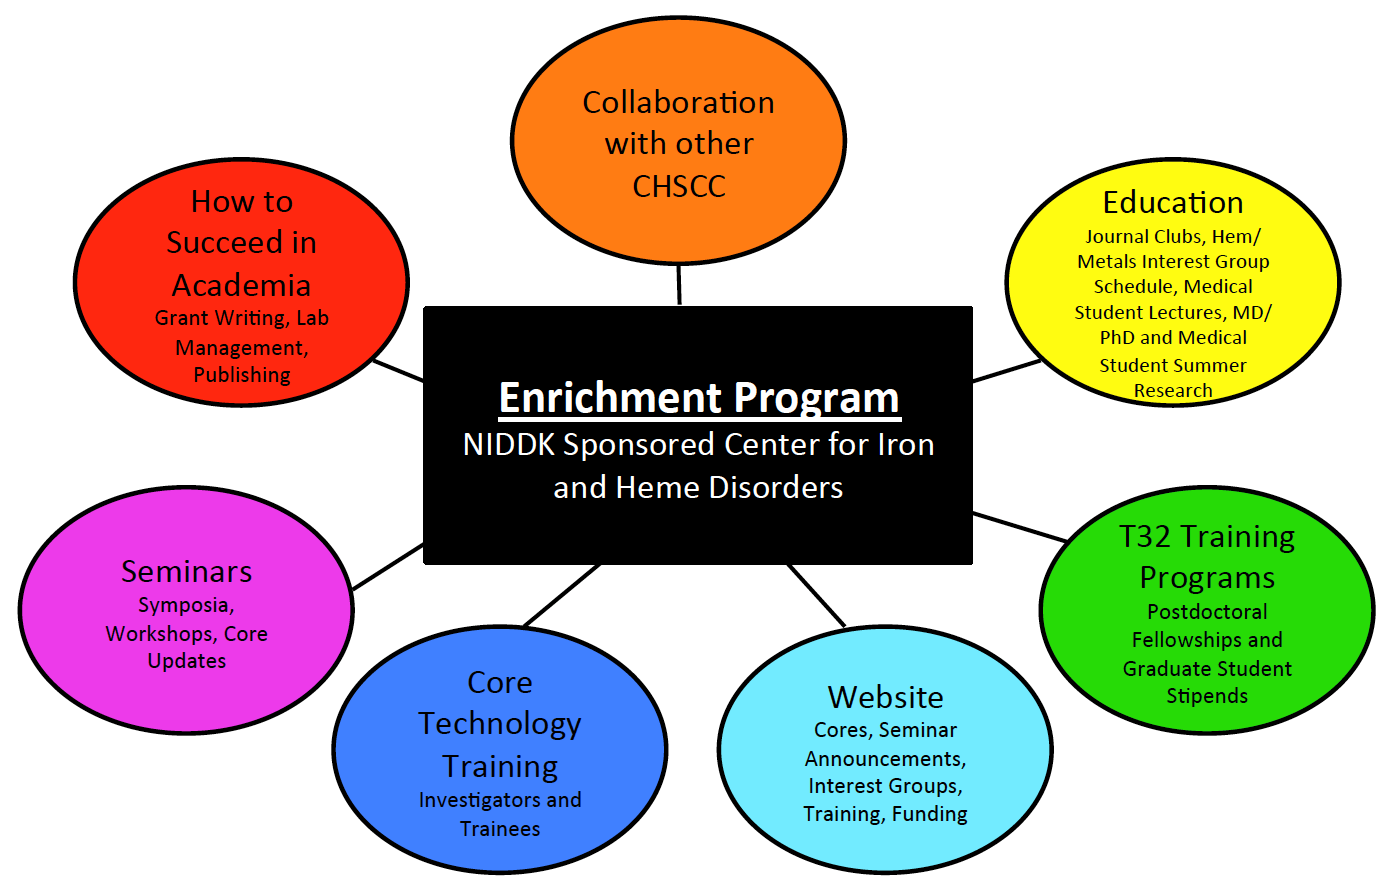 Enrichment Program Links